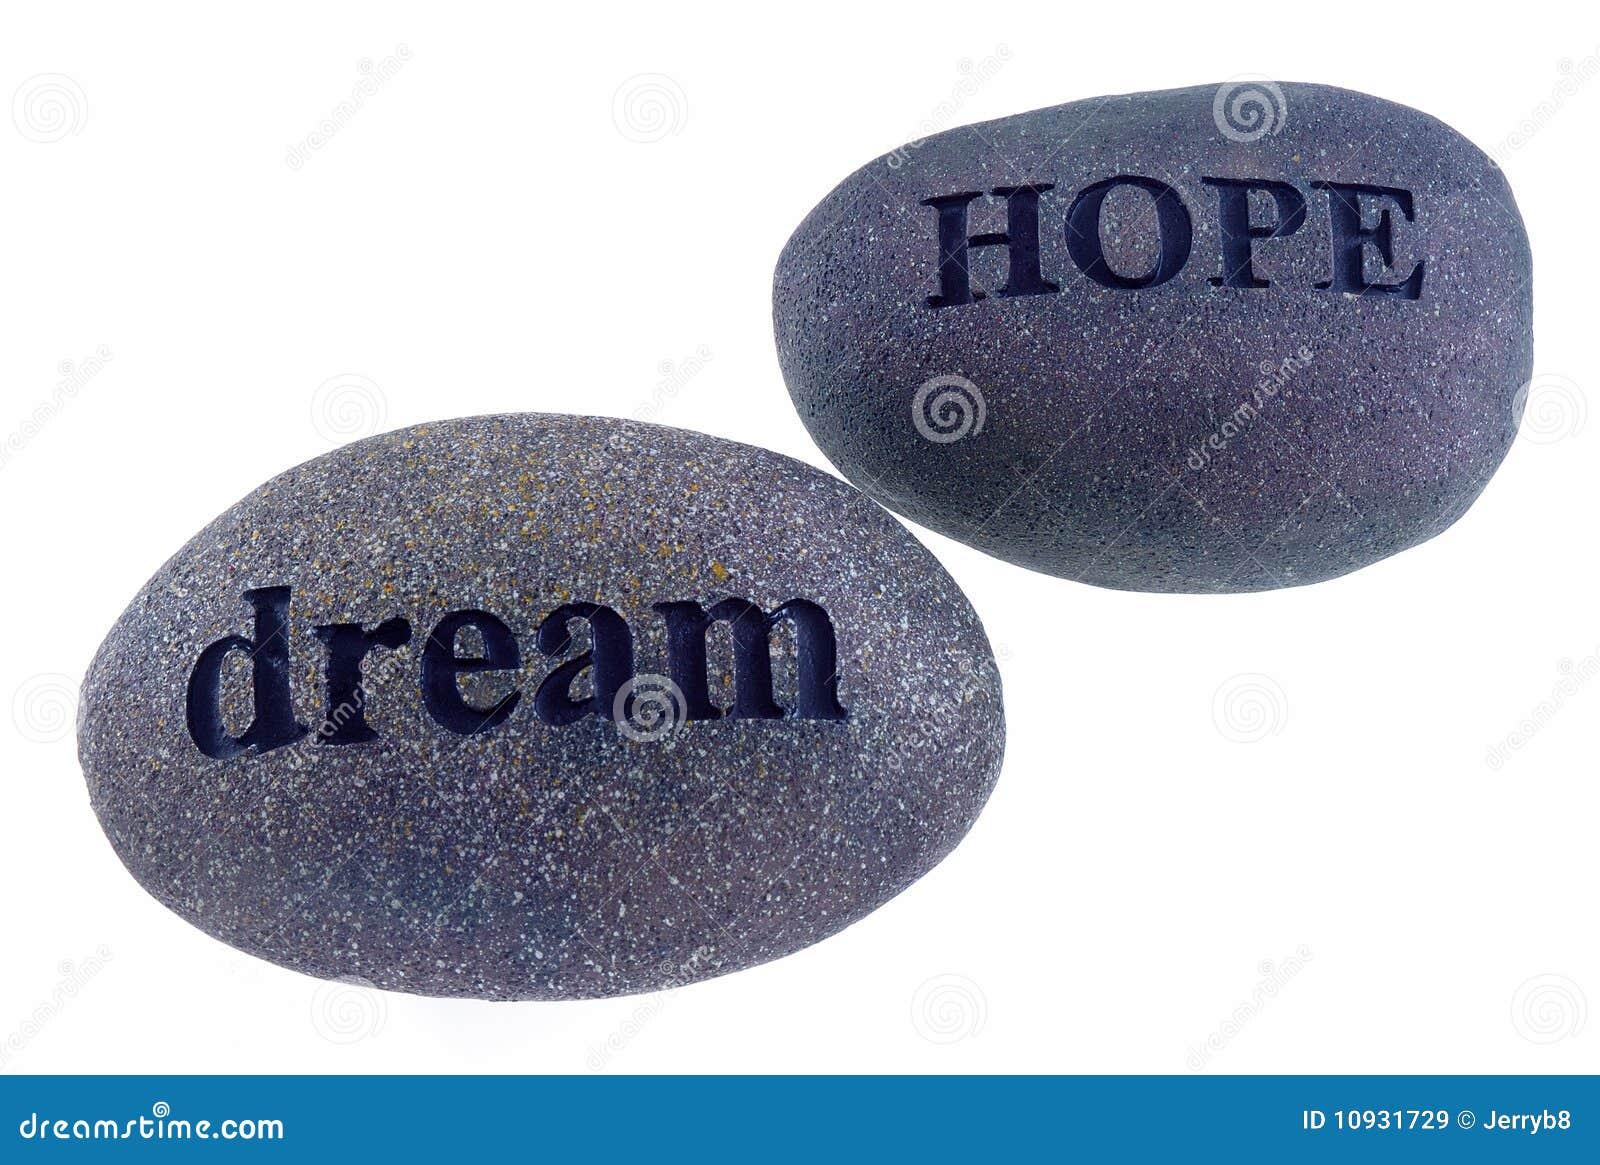 Hope and dream rocks